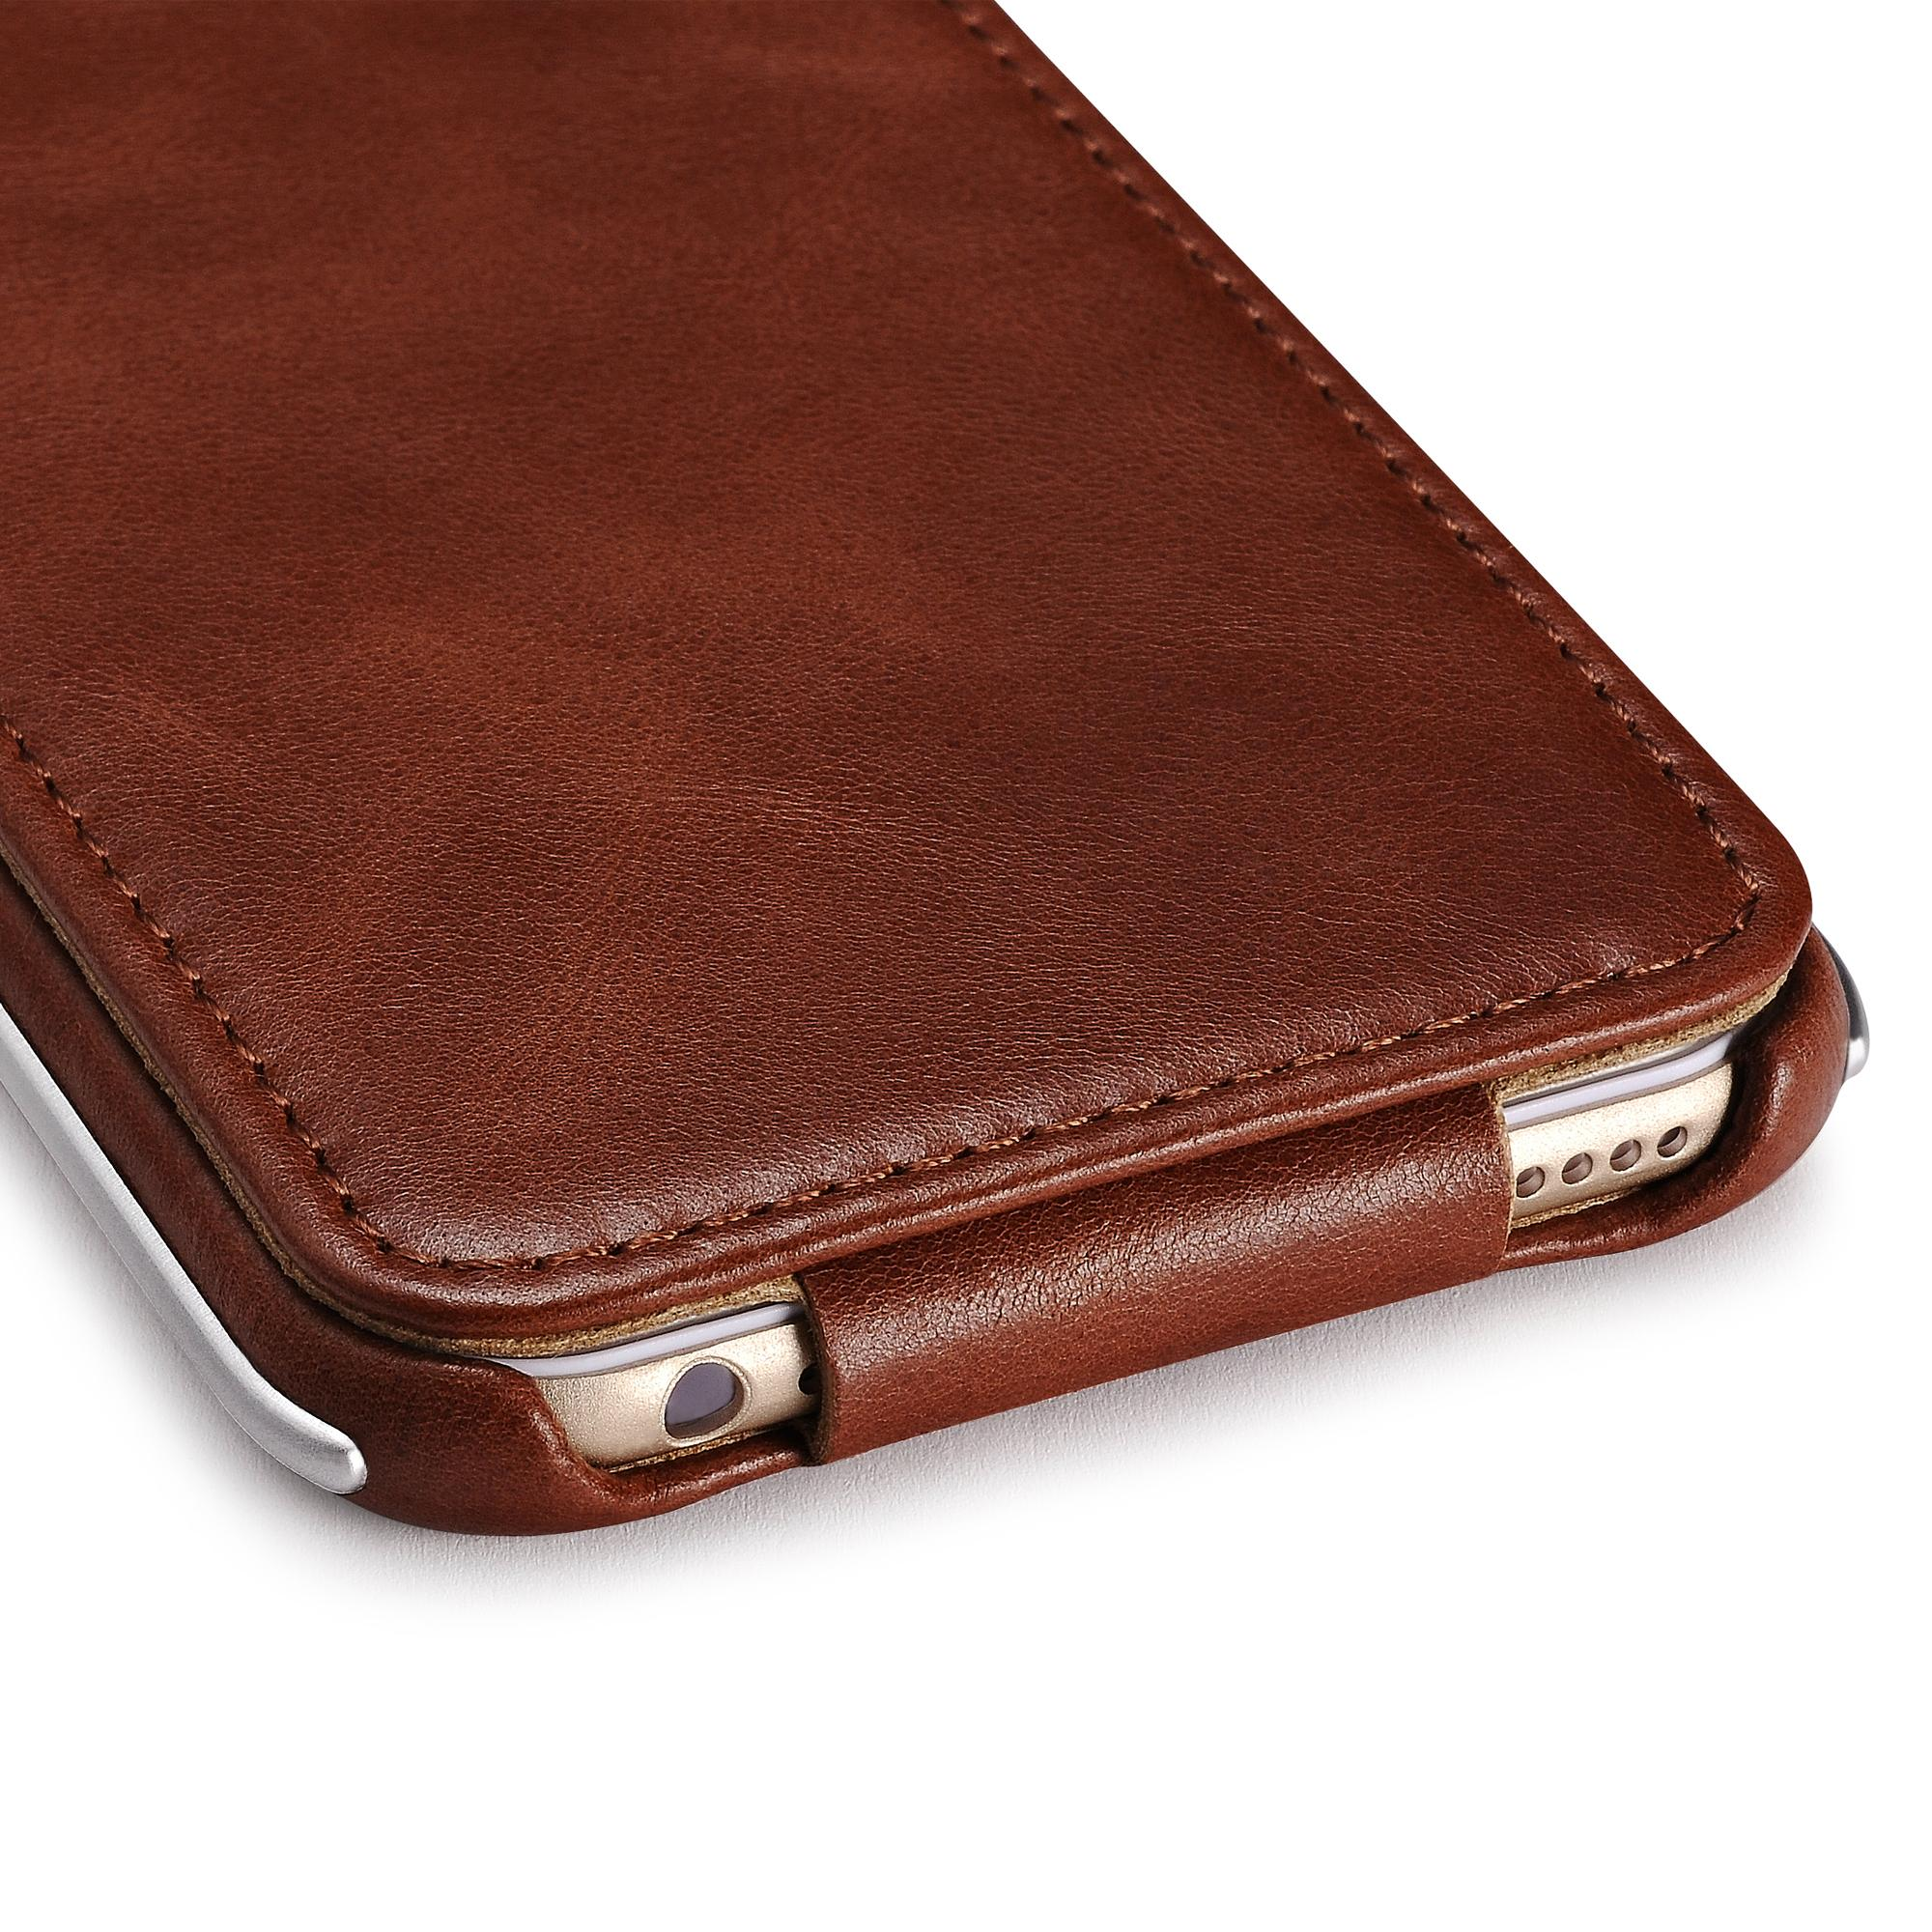 iCarer iPhone 6/6S Metal Warrior Vintage Series Magnetic Flip Leather Case 13